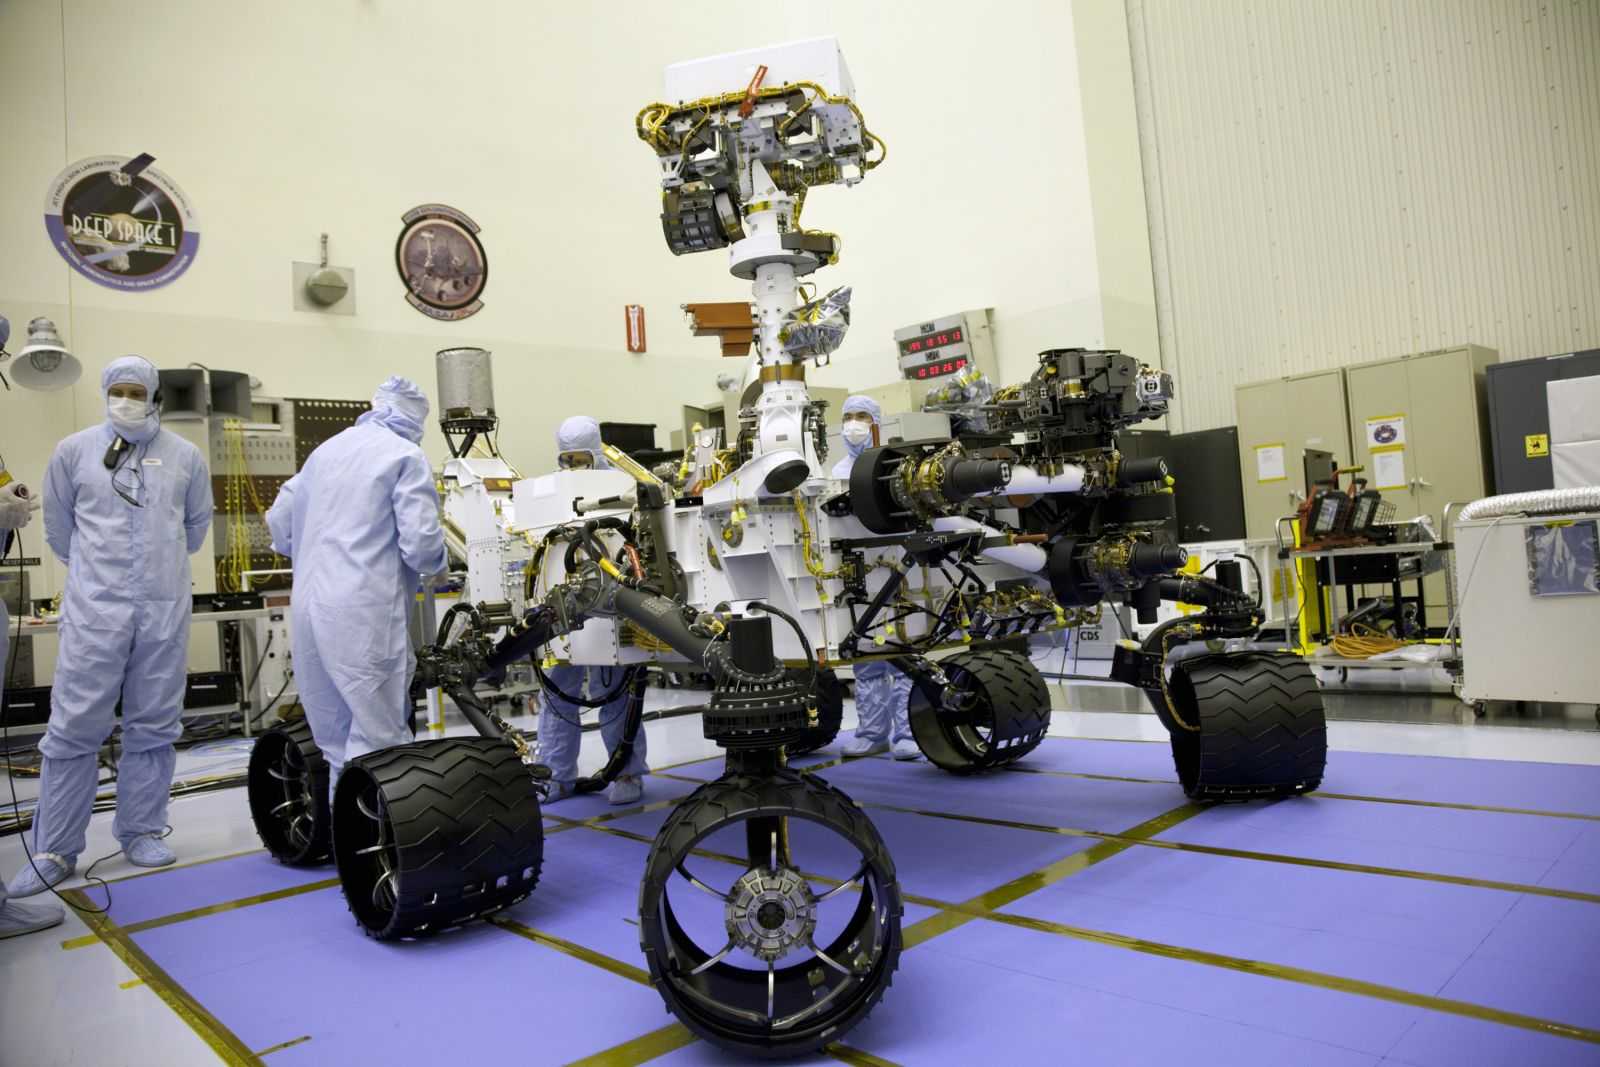 NASA's Mars Science Laboratory rover Curiosity NASA photo posted on SpaceFlight Insider